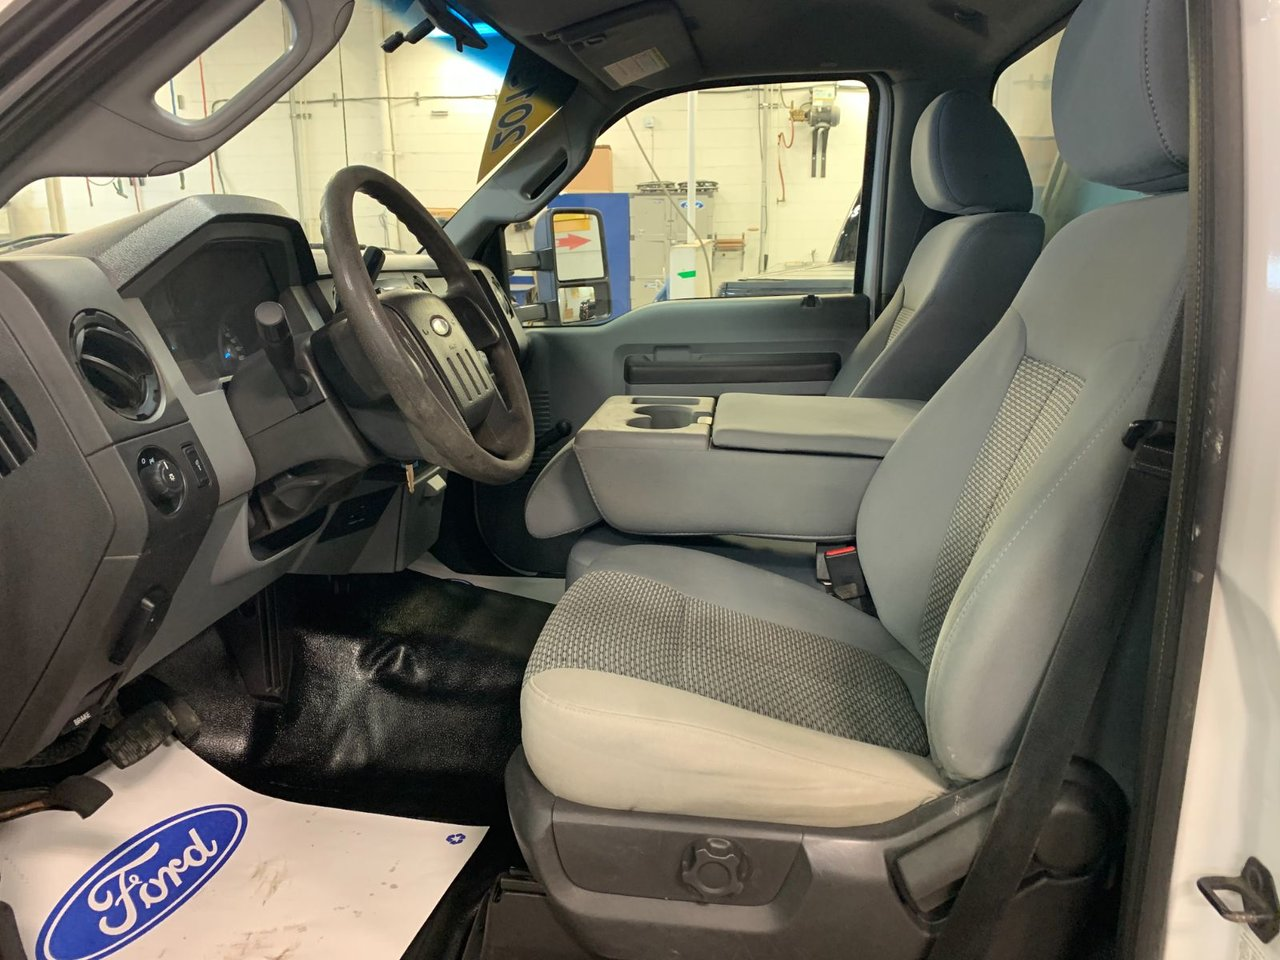 2013 Ford Super duty F-550 DRW CUBE 12 PIEDS AVEC DECK